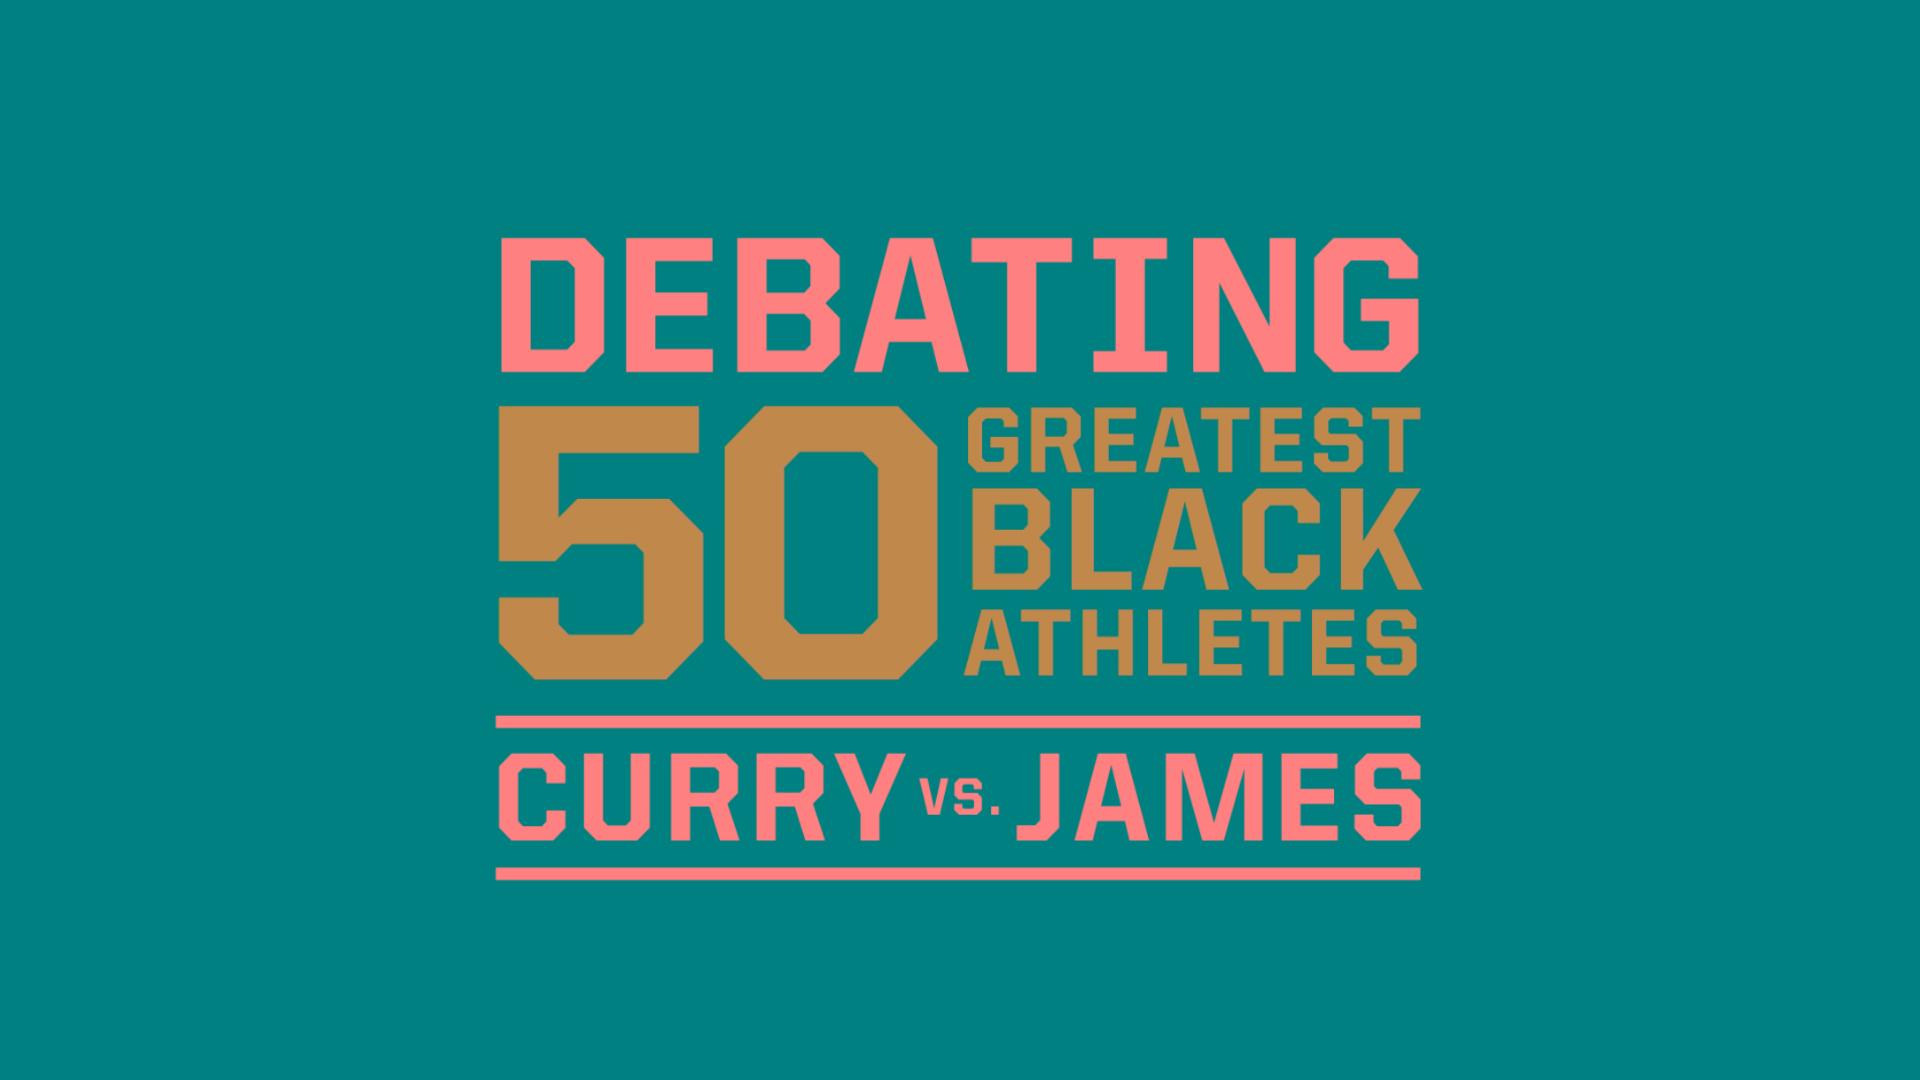 d68983d9f4 50 Greatest Black Athletes debate: LeBron James vs. Stephen Curry